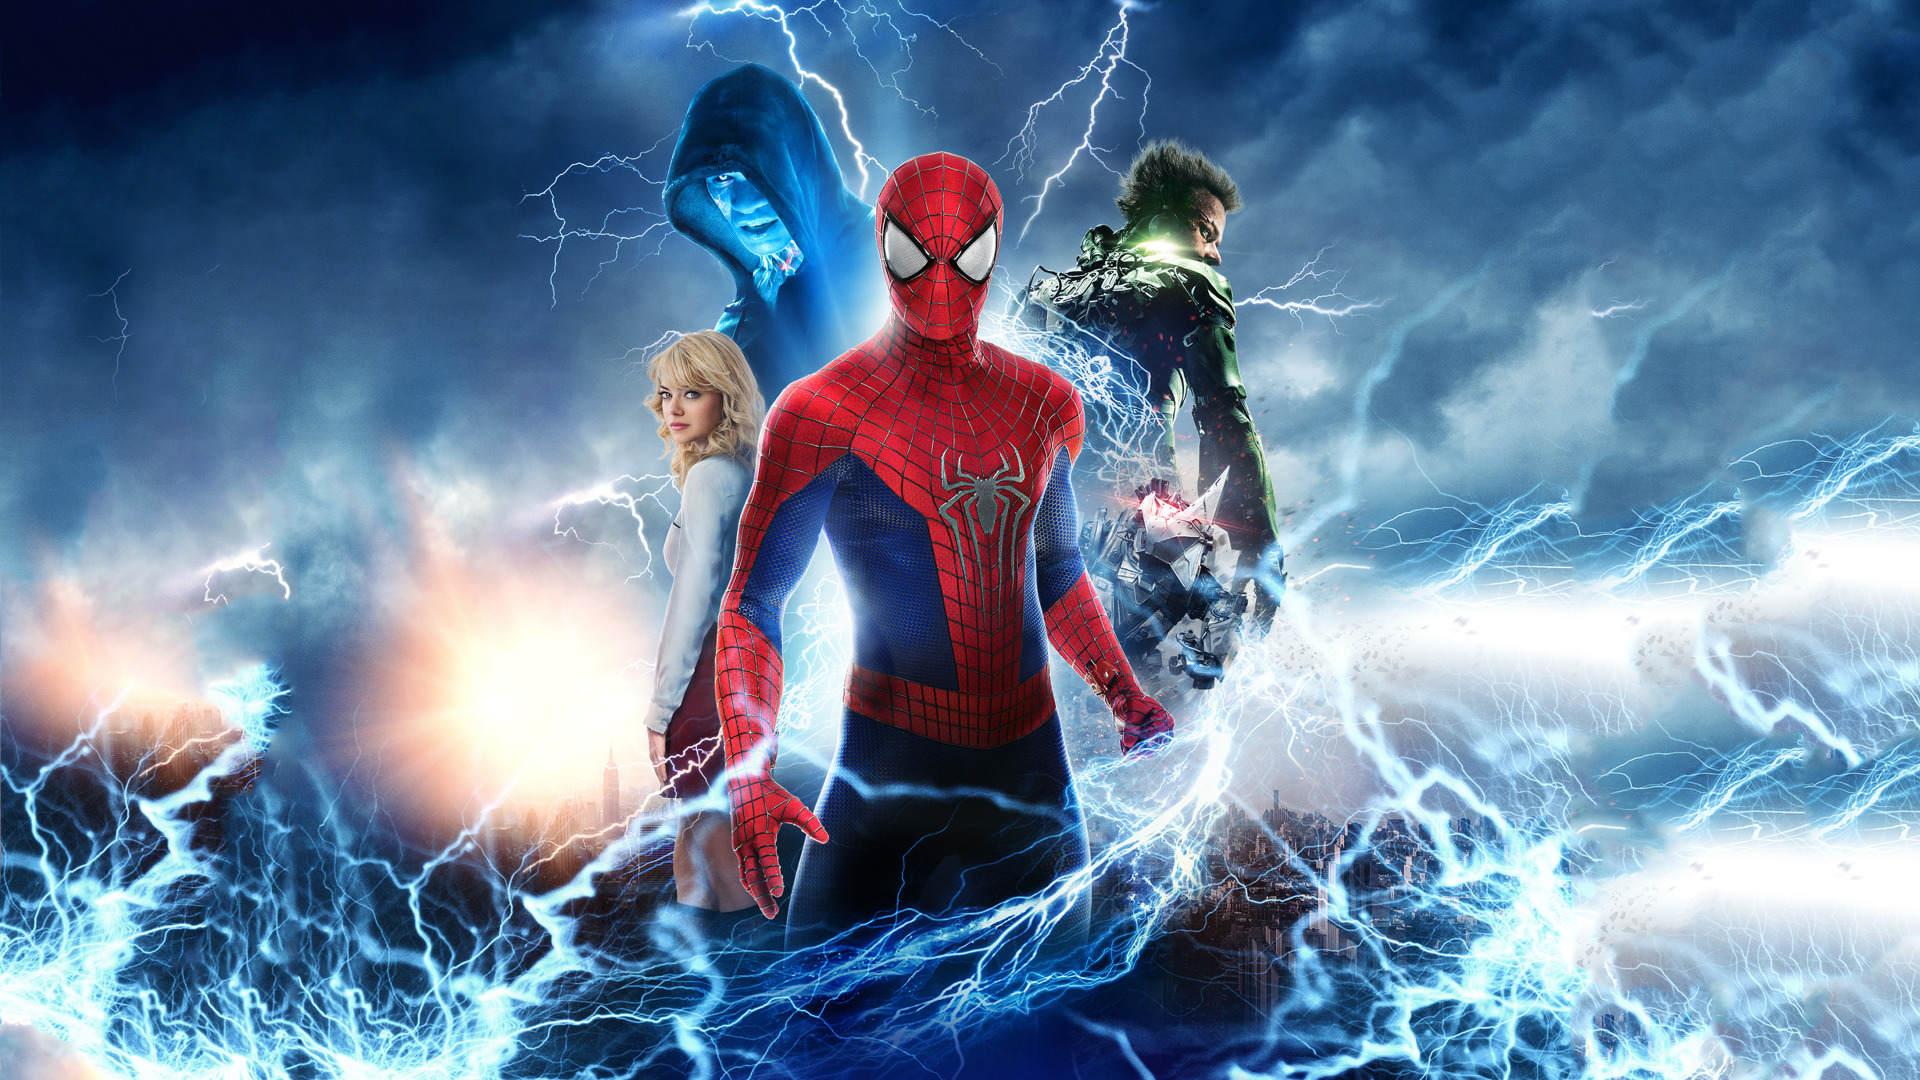 The Amazing Spider-Man 2' Revisited – PlexReel